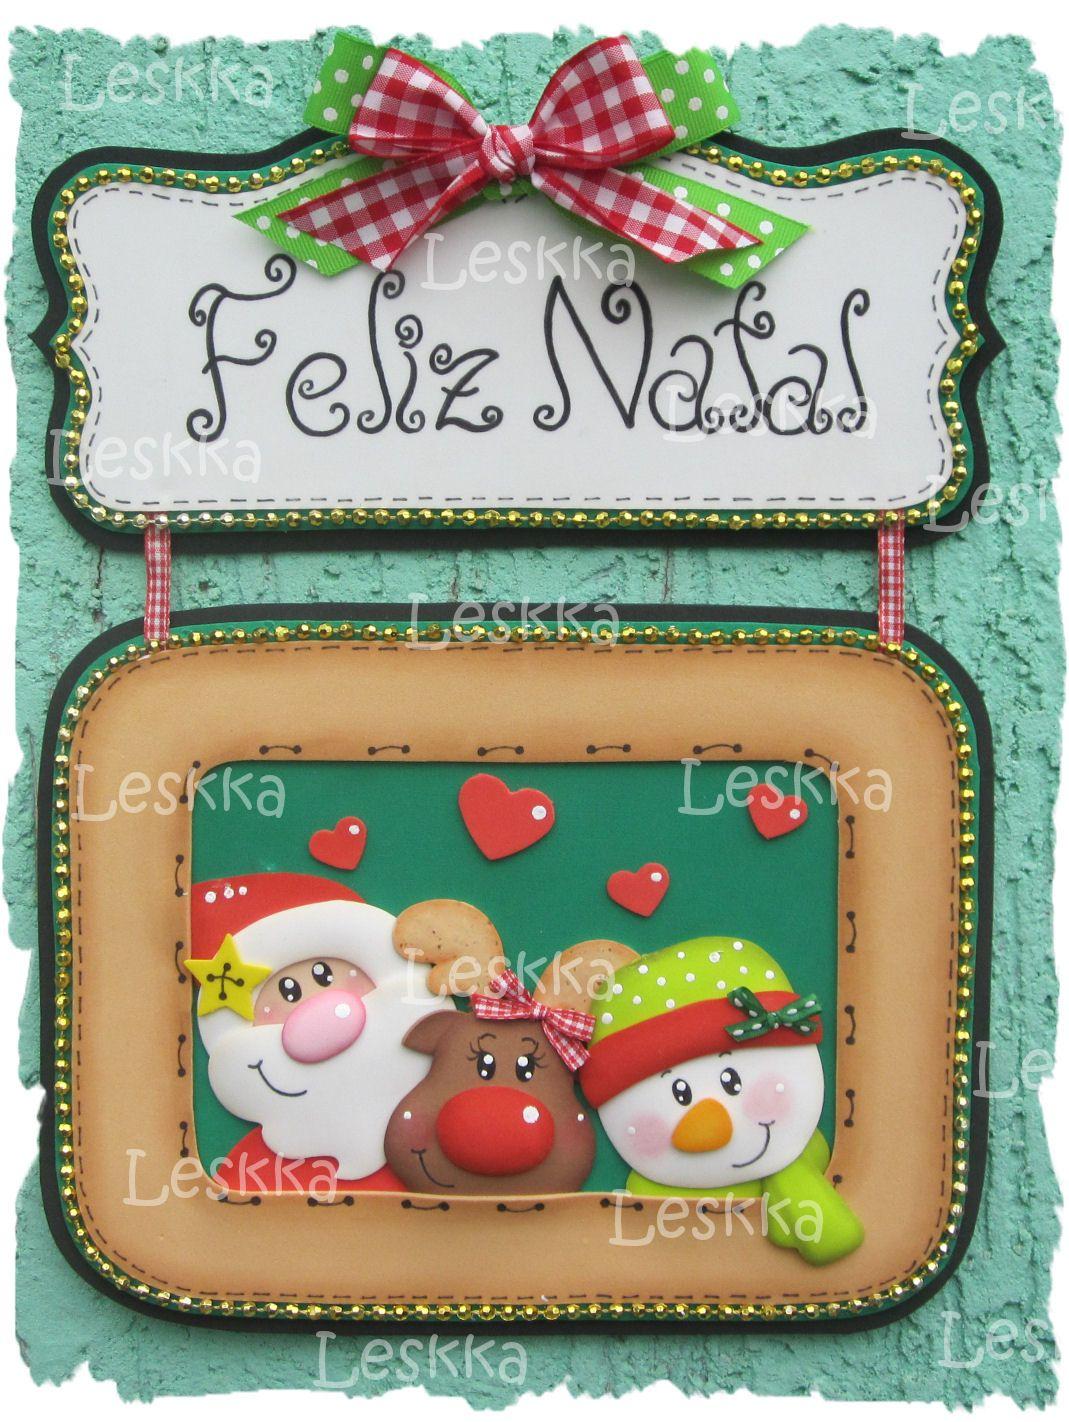 Pin de pri roveri en moldes pinterest navidad goma - Manualidades navidad goma eva ...